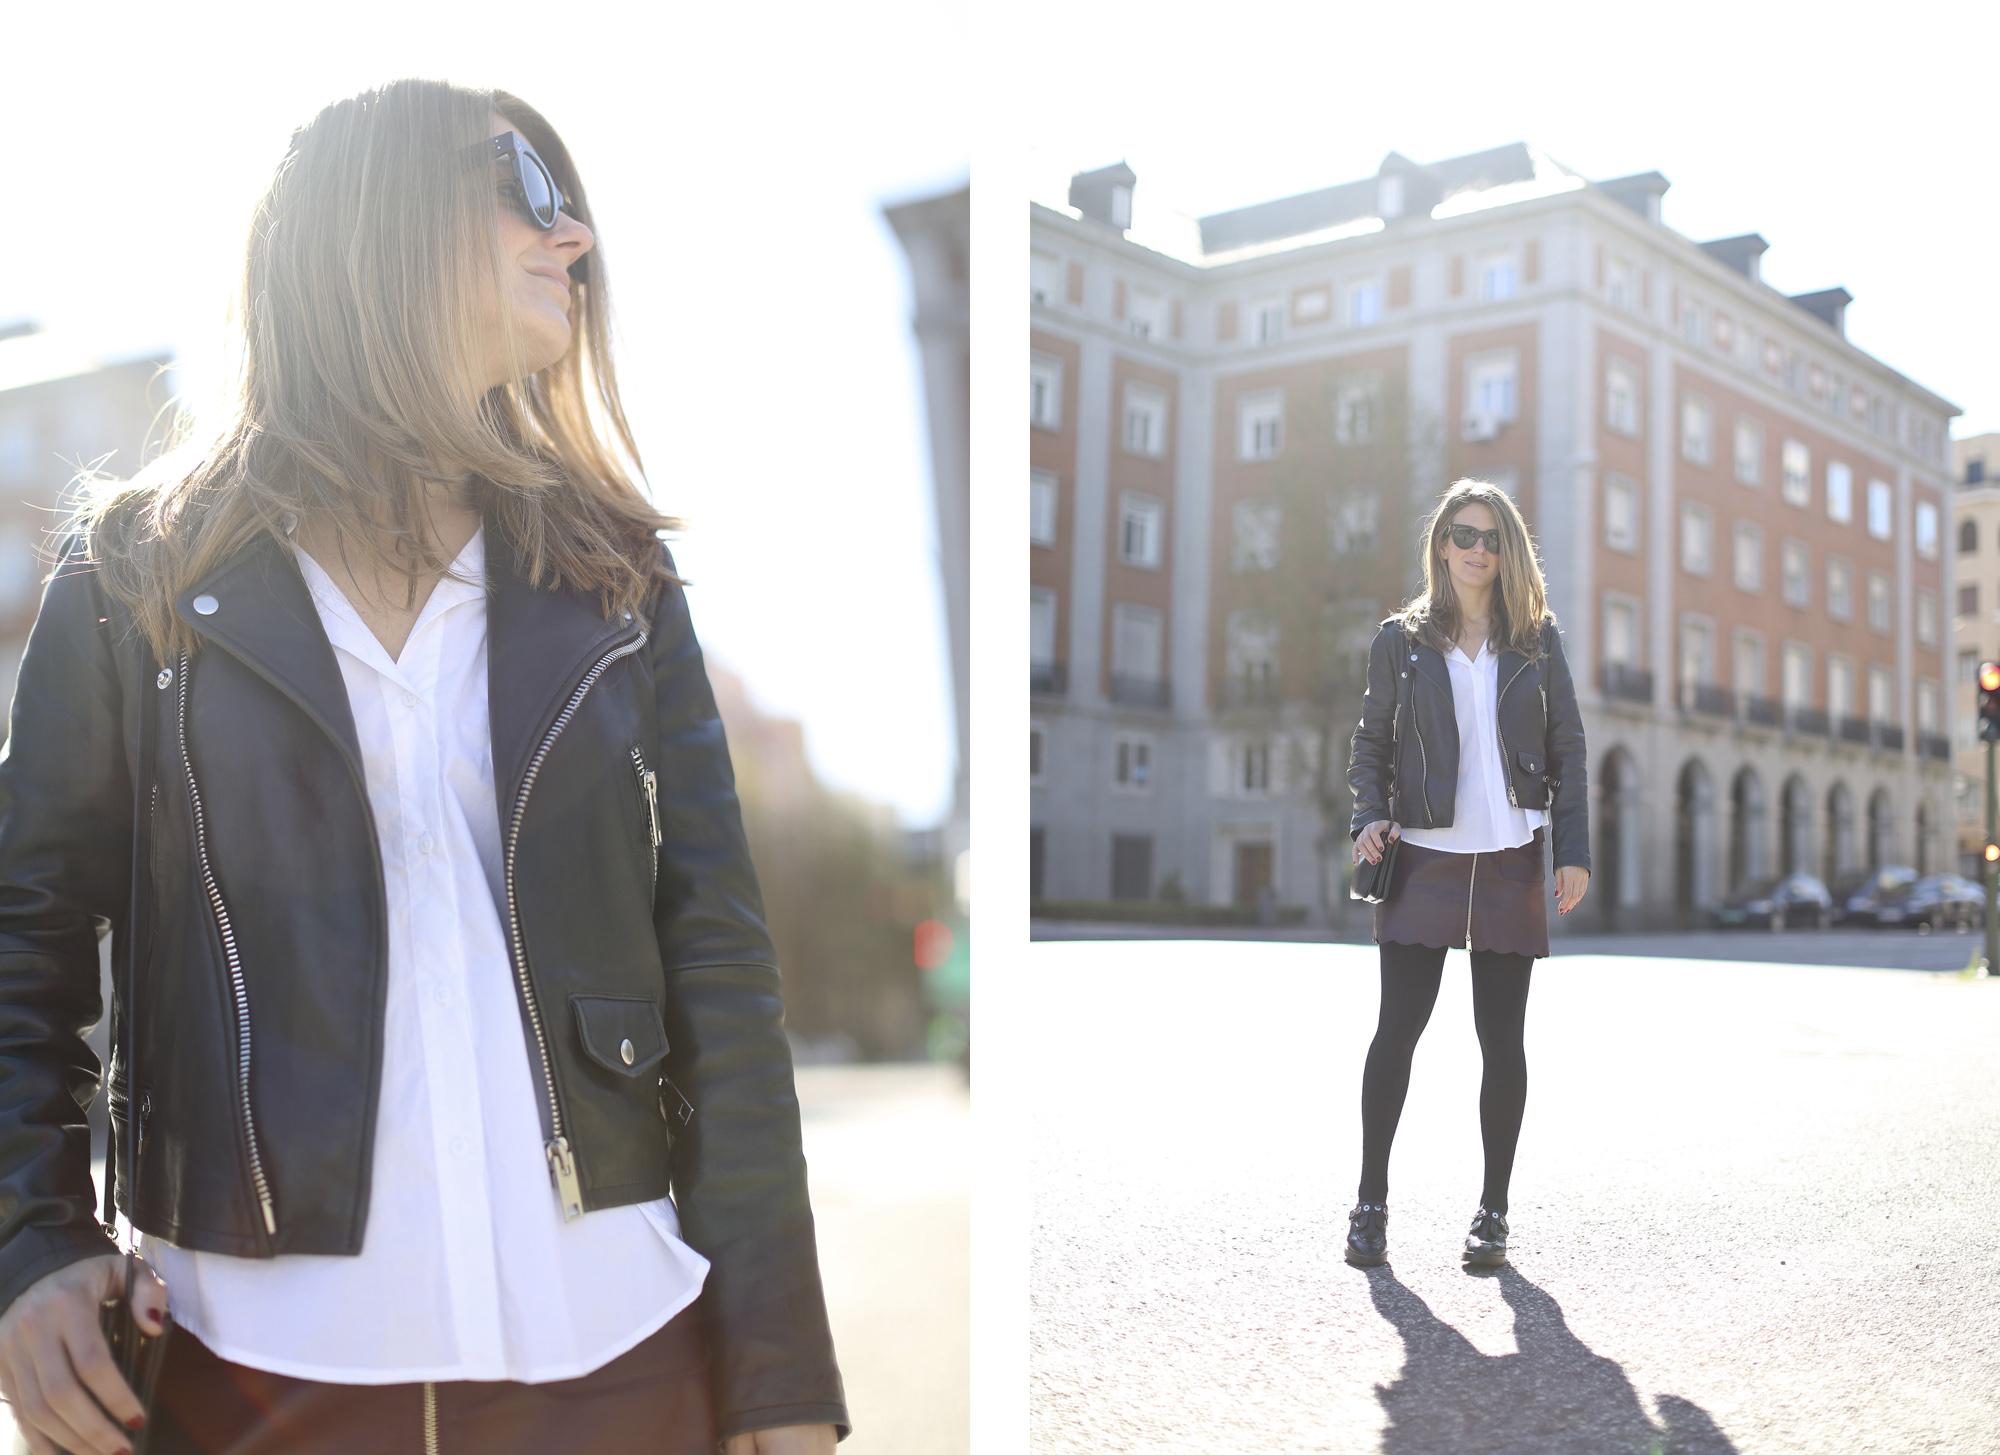 Clochet_streetstyle_maxandCo_leatherminiskirt_h&mtrend_blouse_sandroparis-brogues-14